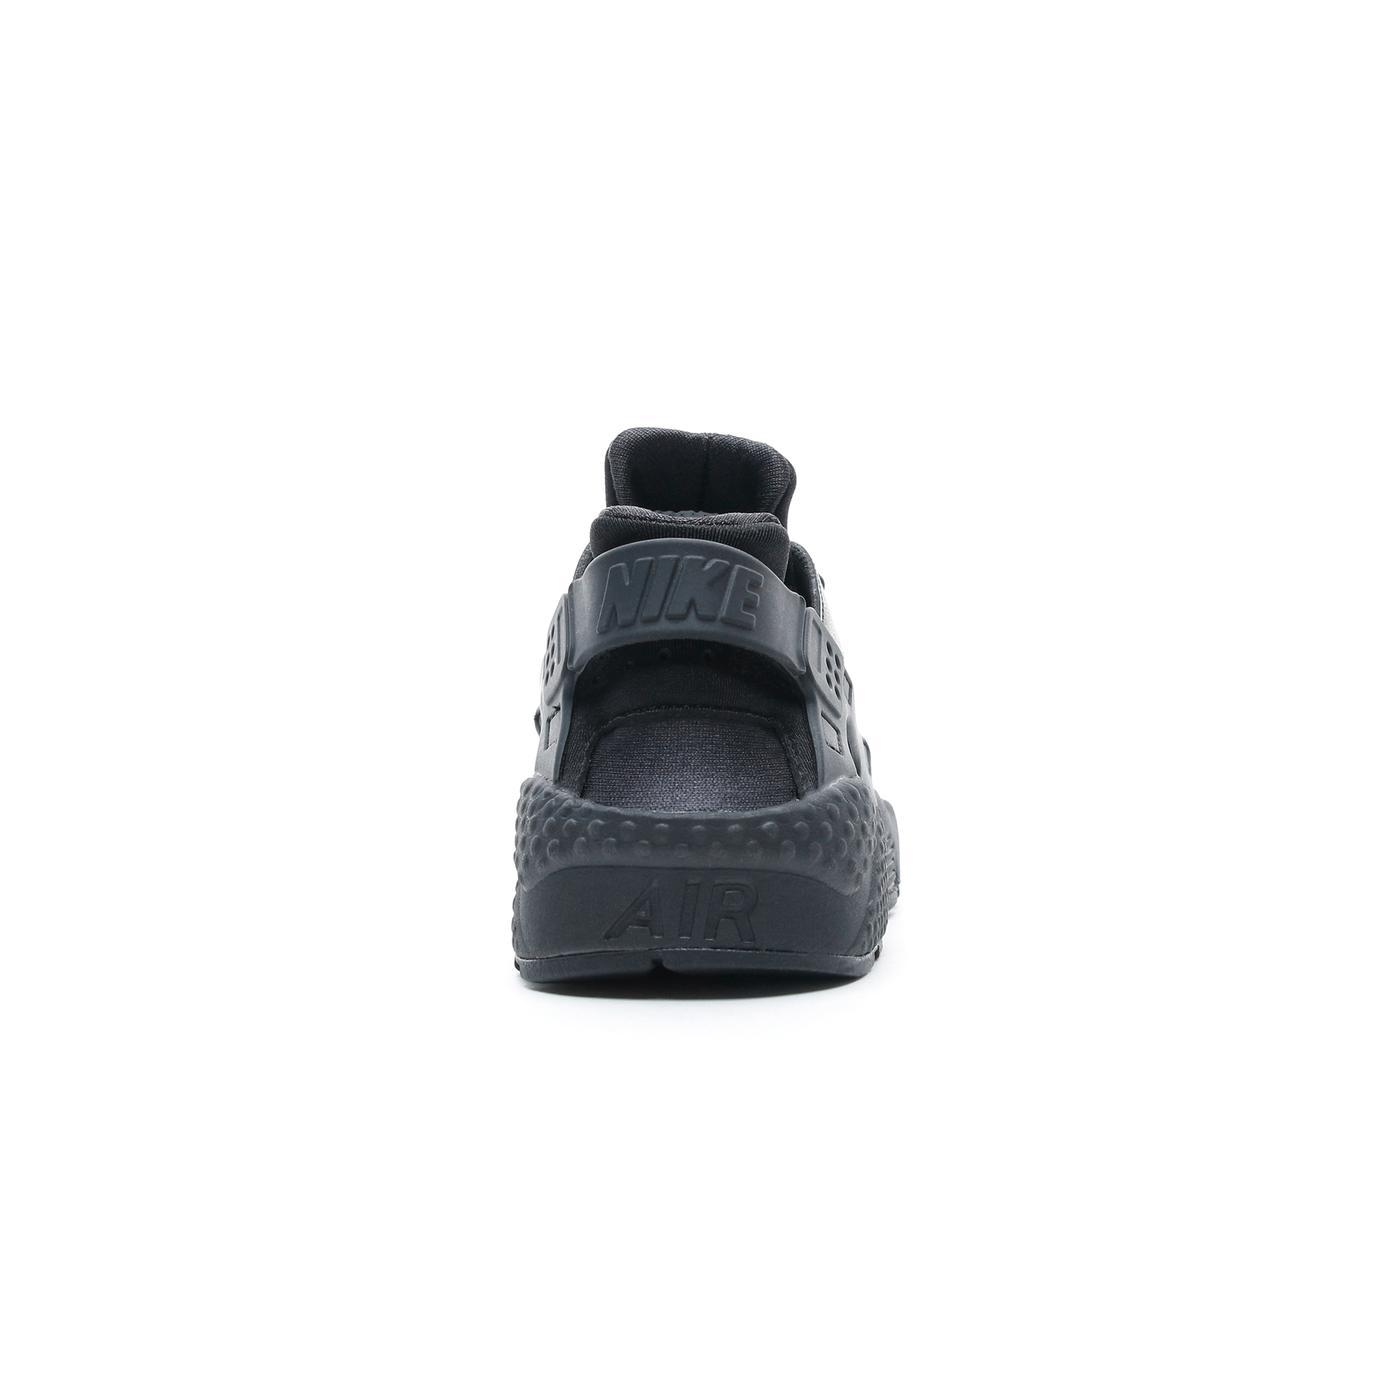 Nike Air Huarache Run Kadın Siyah Spor Ayakkabı